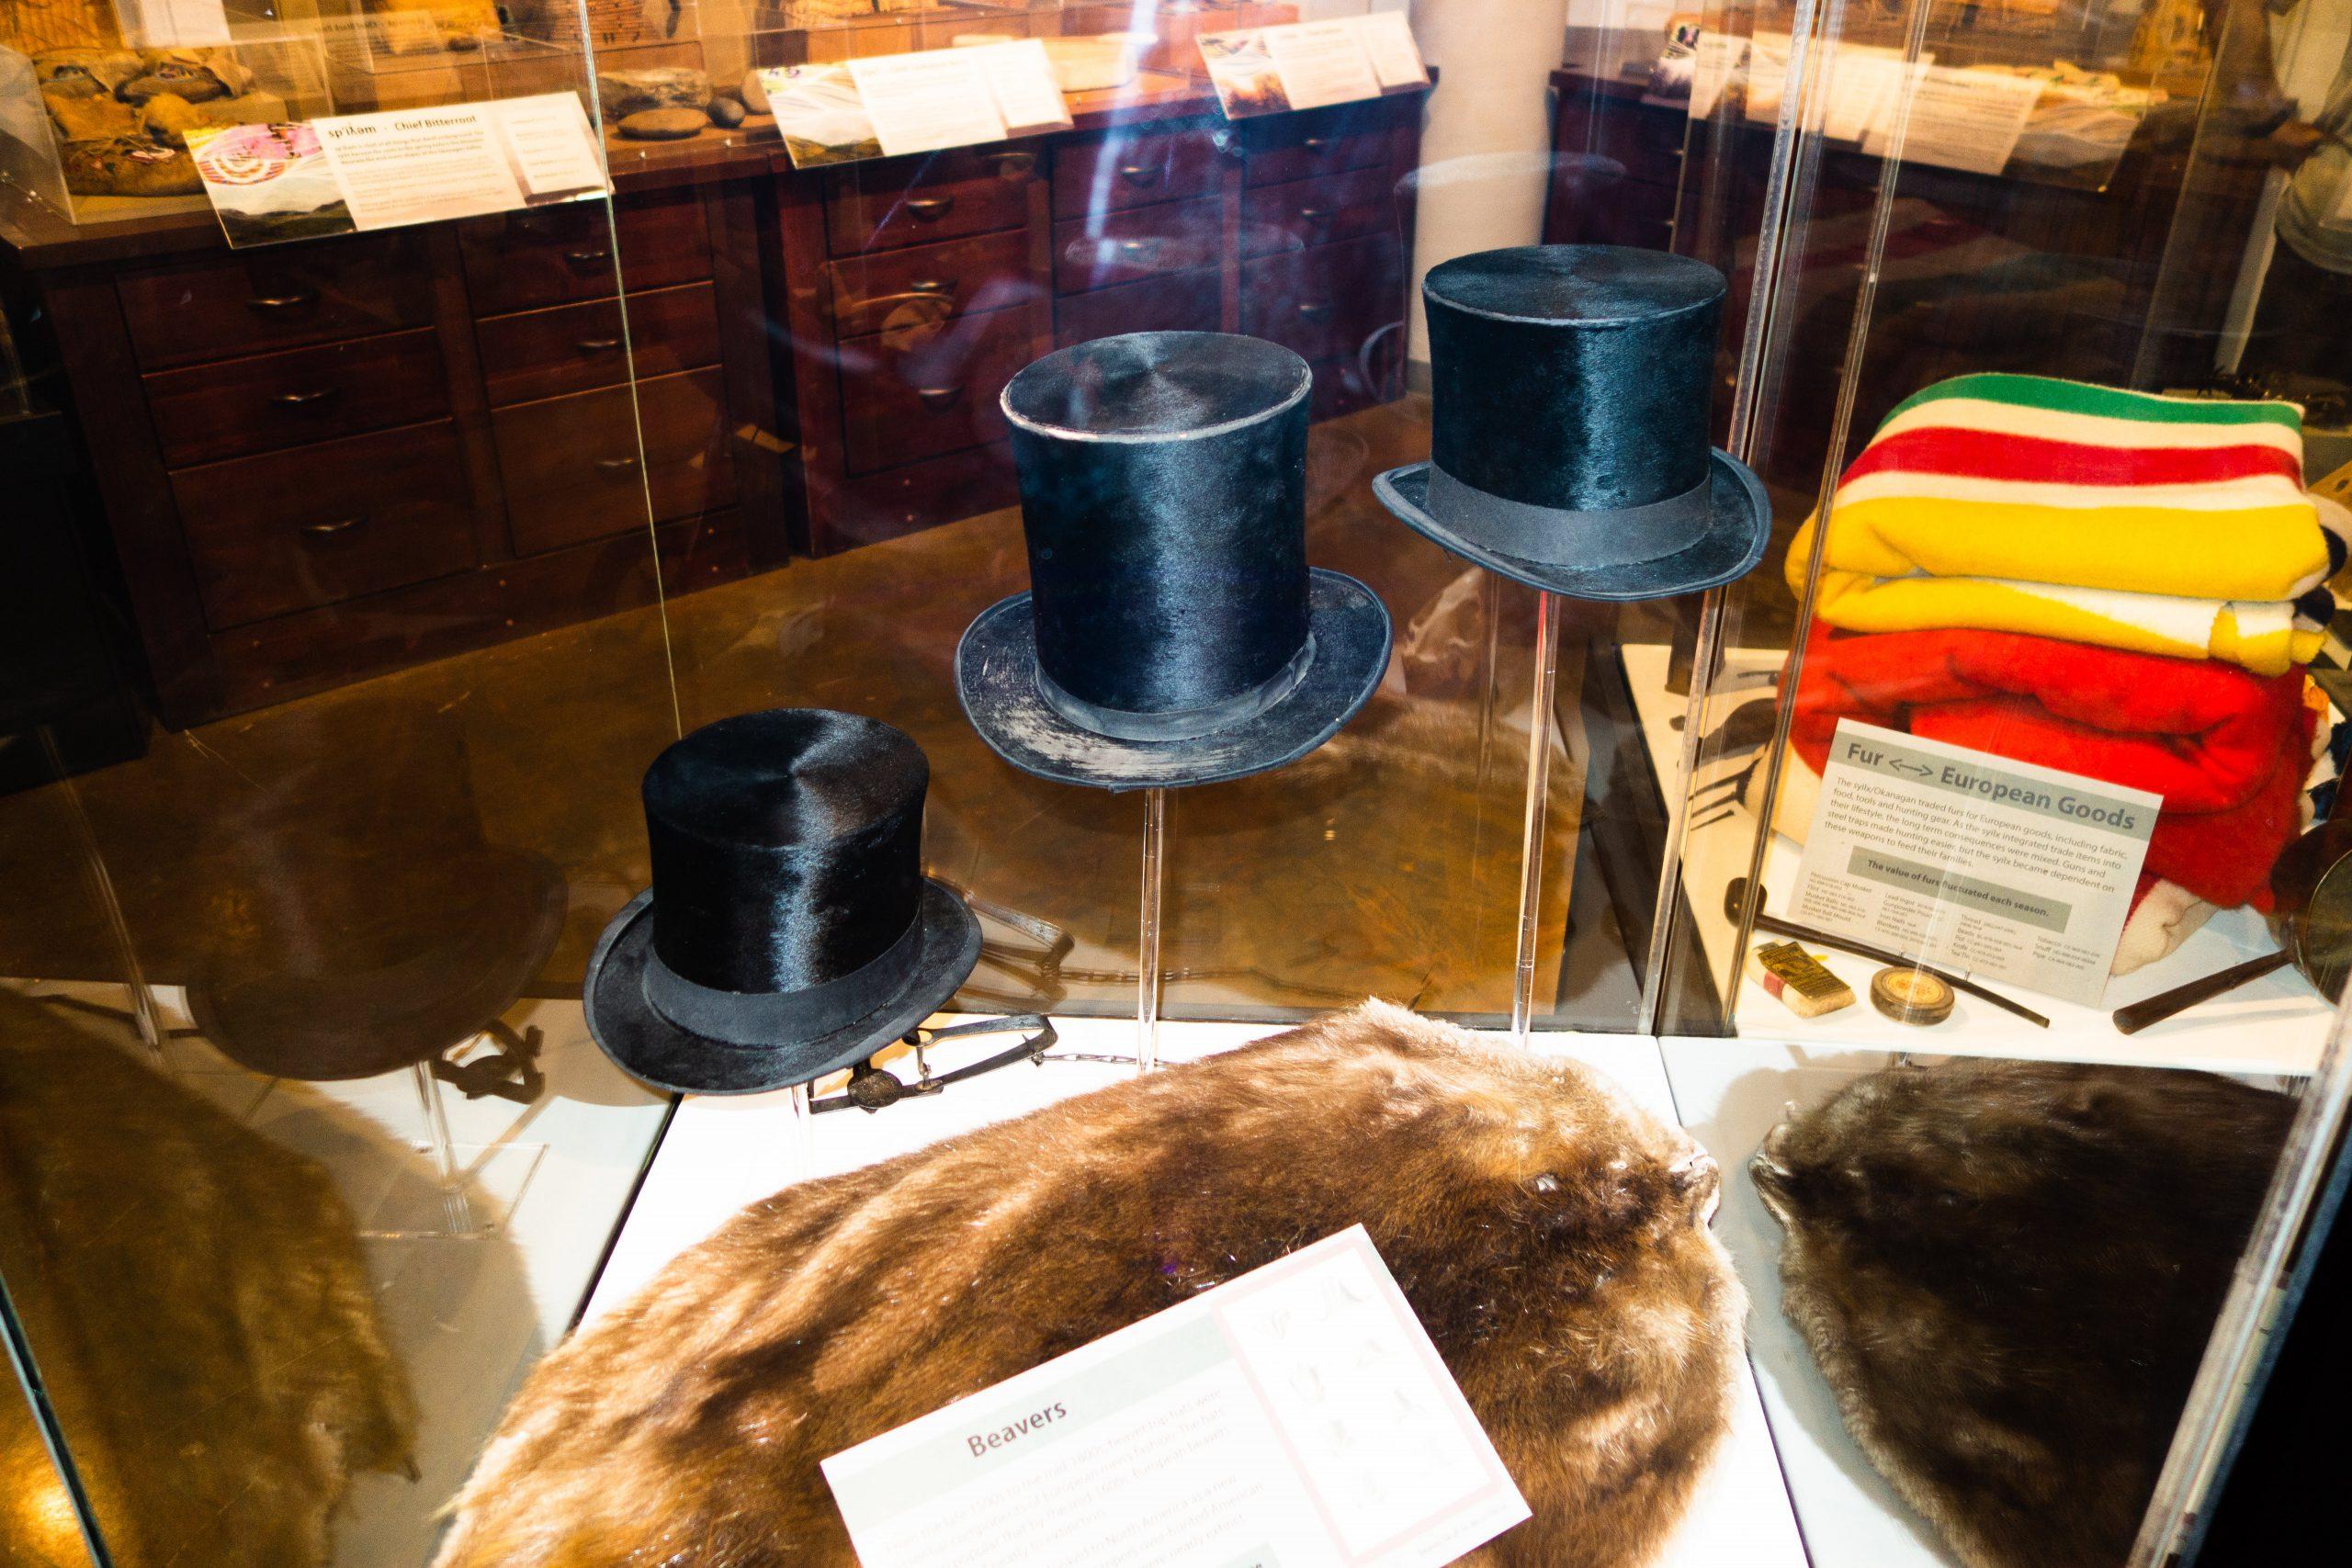 Antique Beaver Top Hats, made in the late 1830's. Kelowna Heritage Museum, Kelowna, British Columbia.